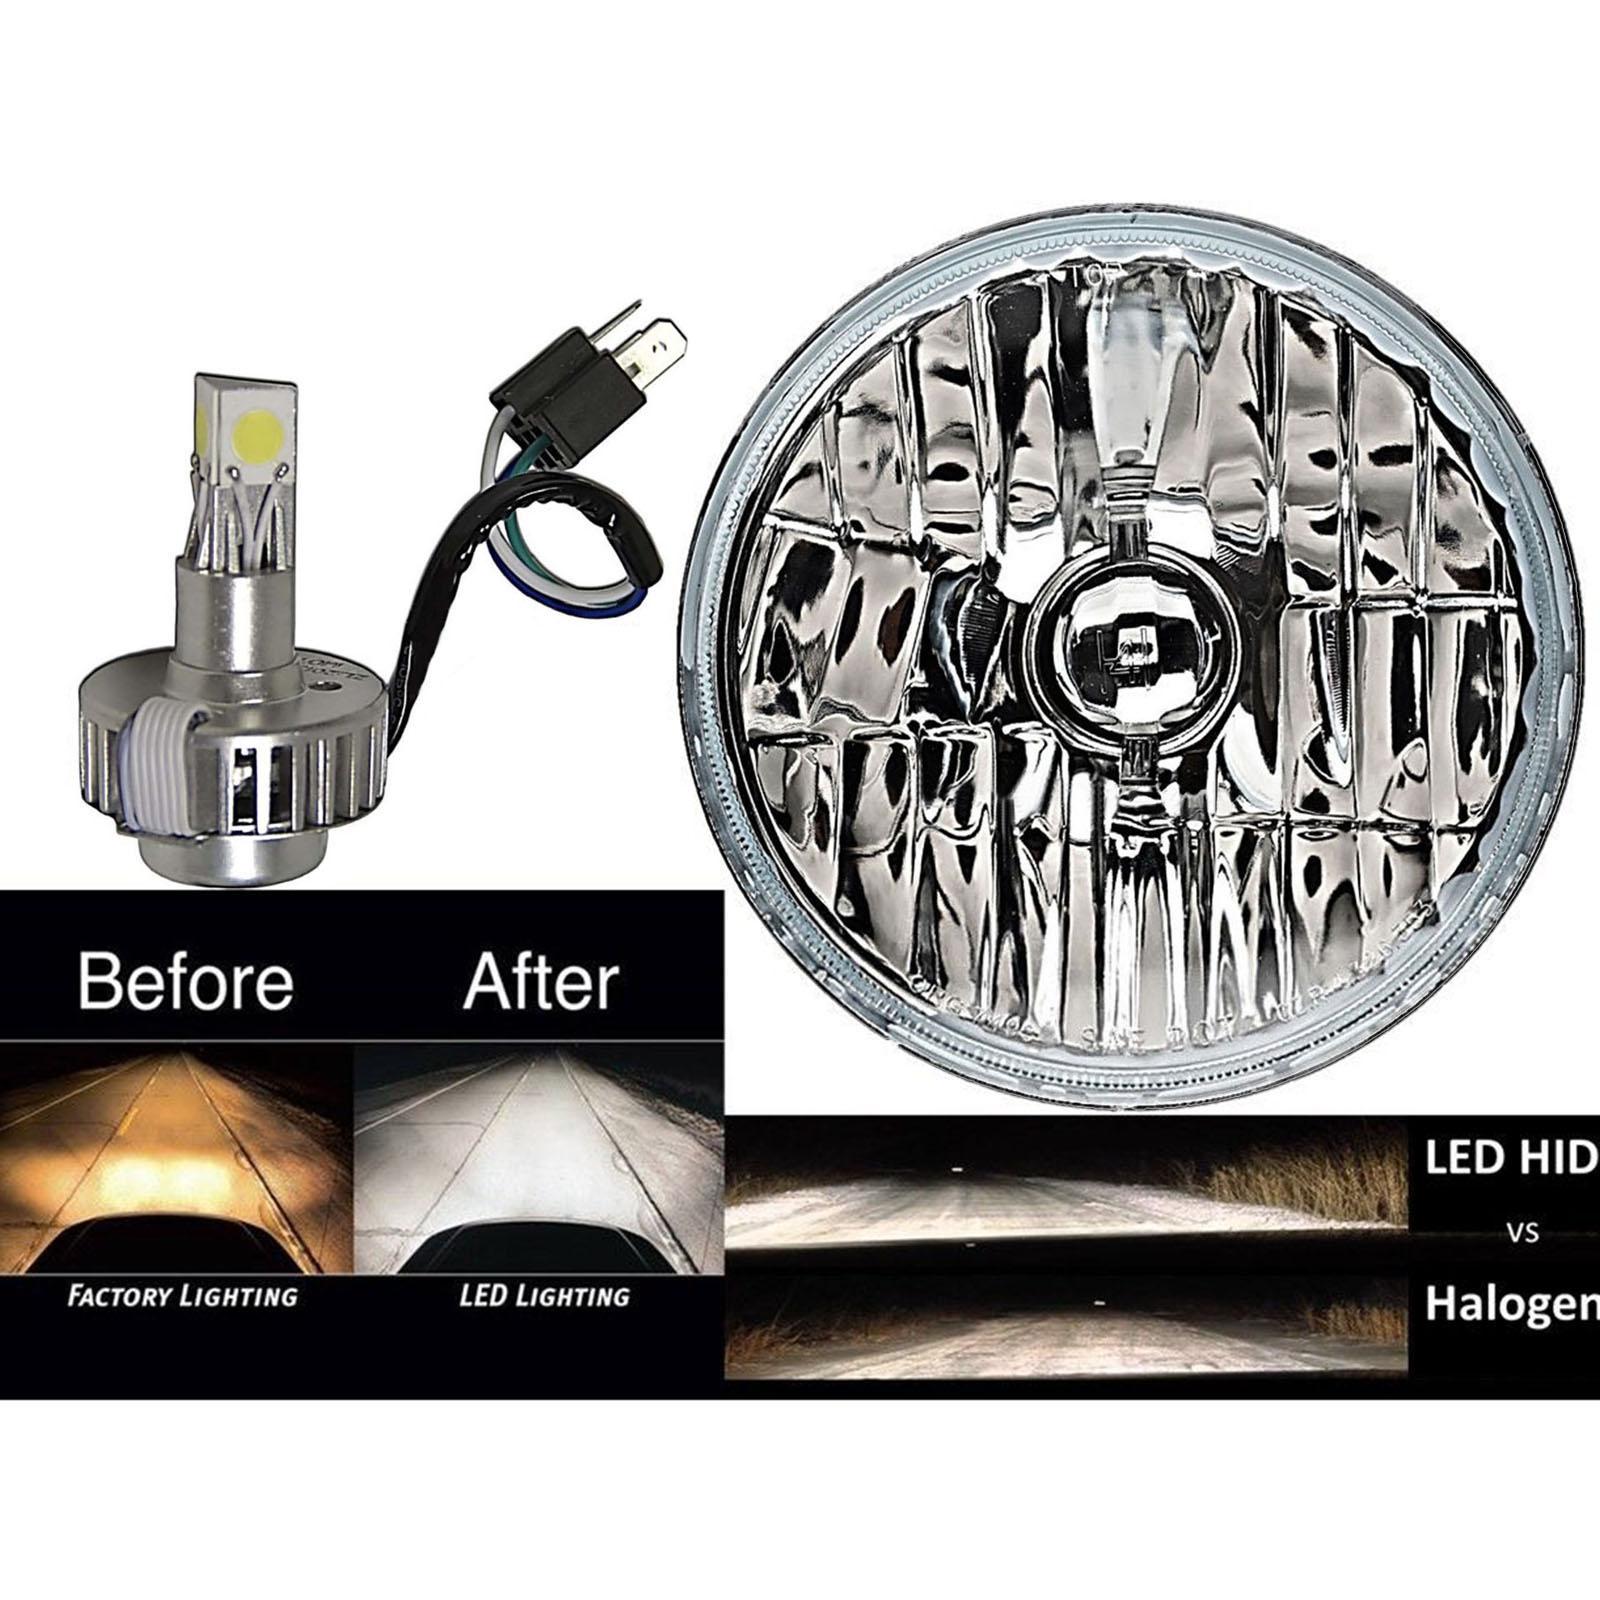 hight resolution of h6024 bulb wiring diagram data schema 6014 headlight wiring diagram